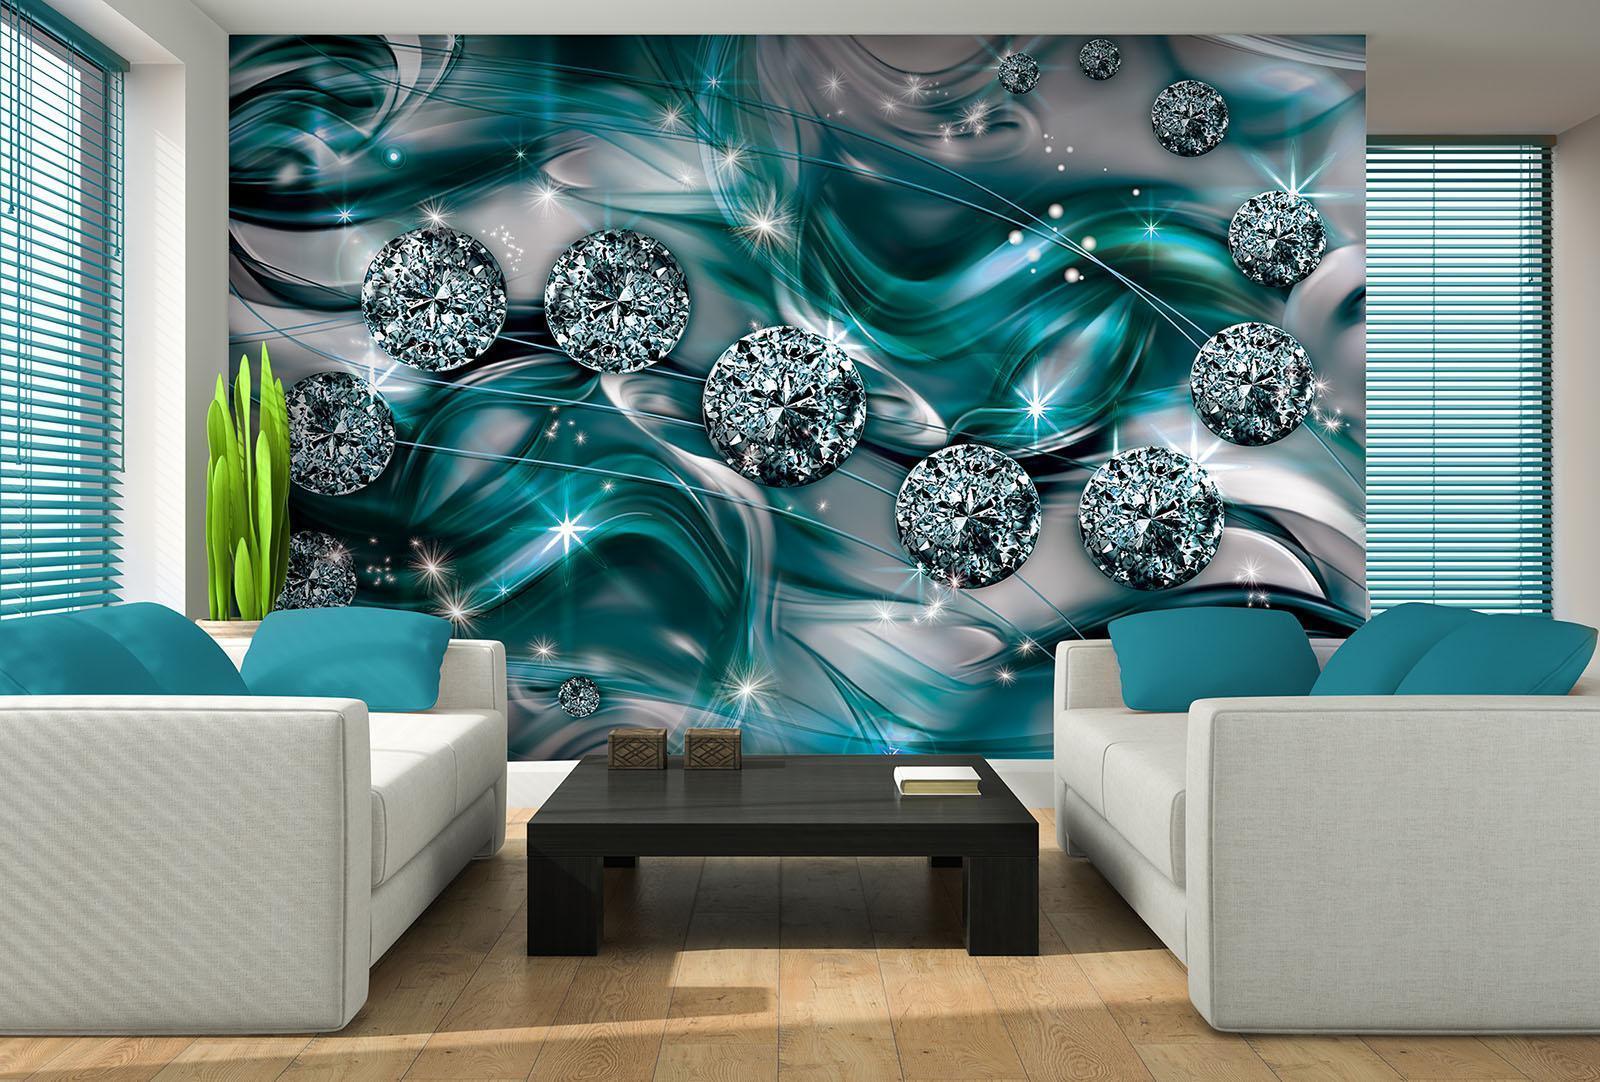 Vließ Fototapete Tapete Wandbild Photo Wallpaper Mural Diamant Abstraktion 10578